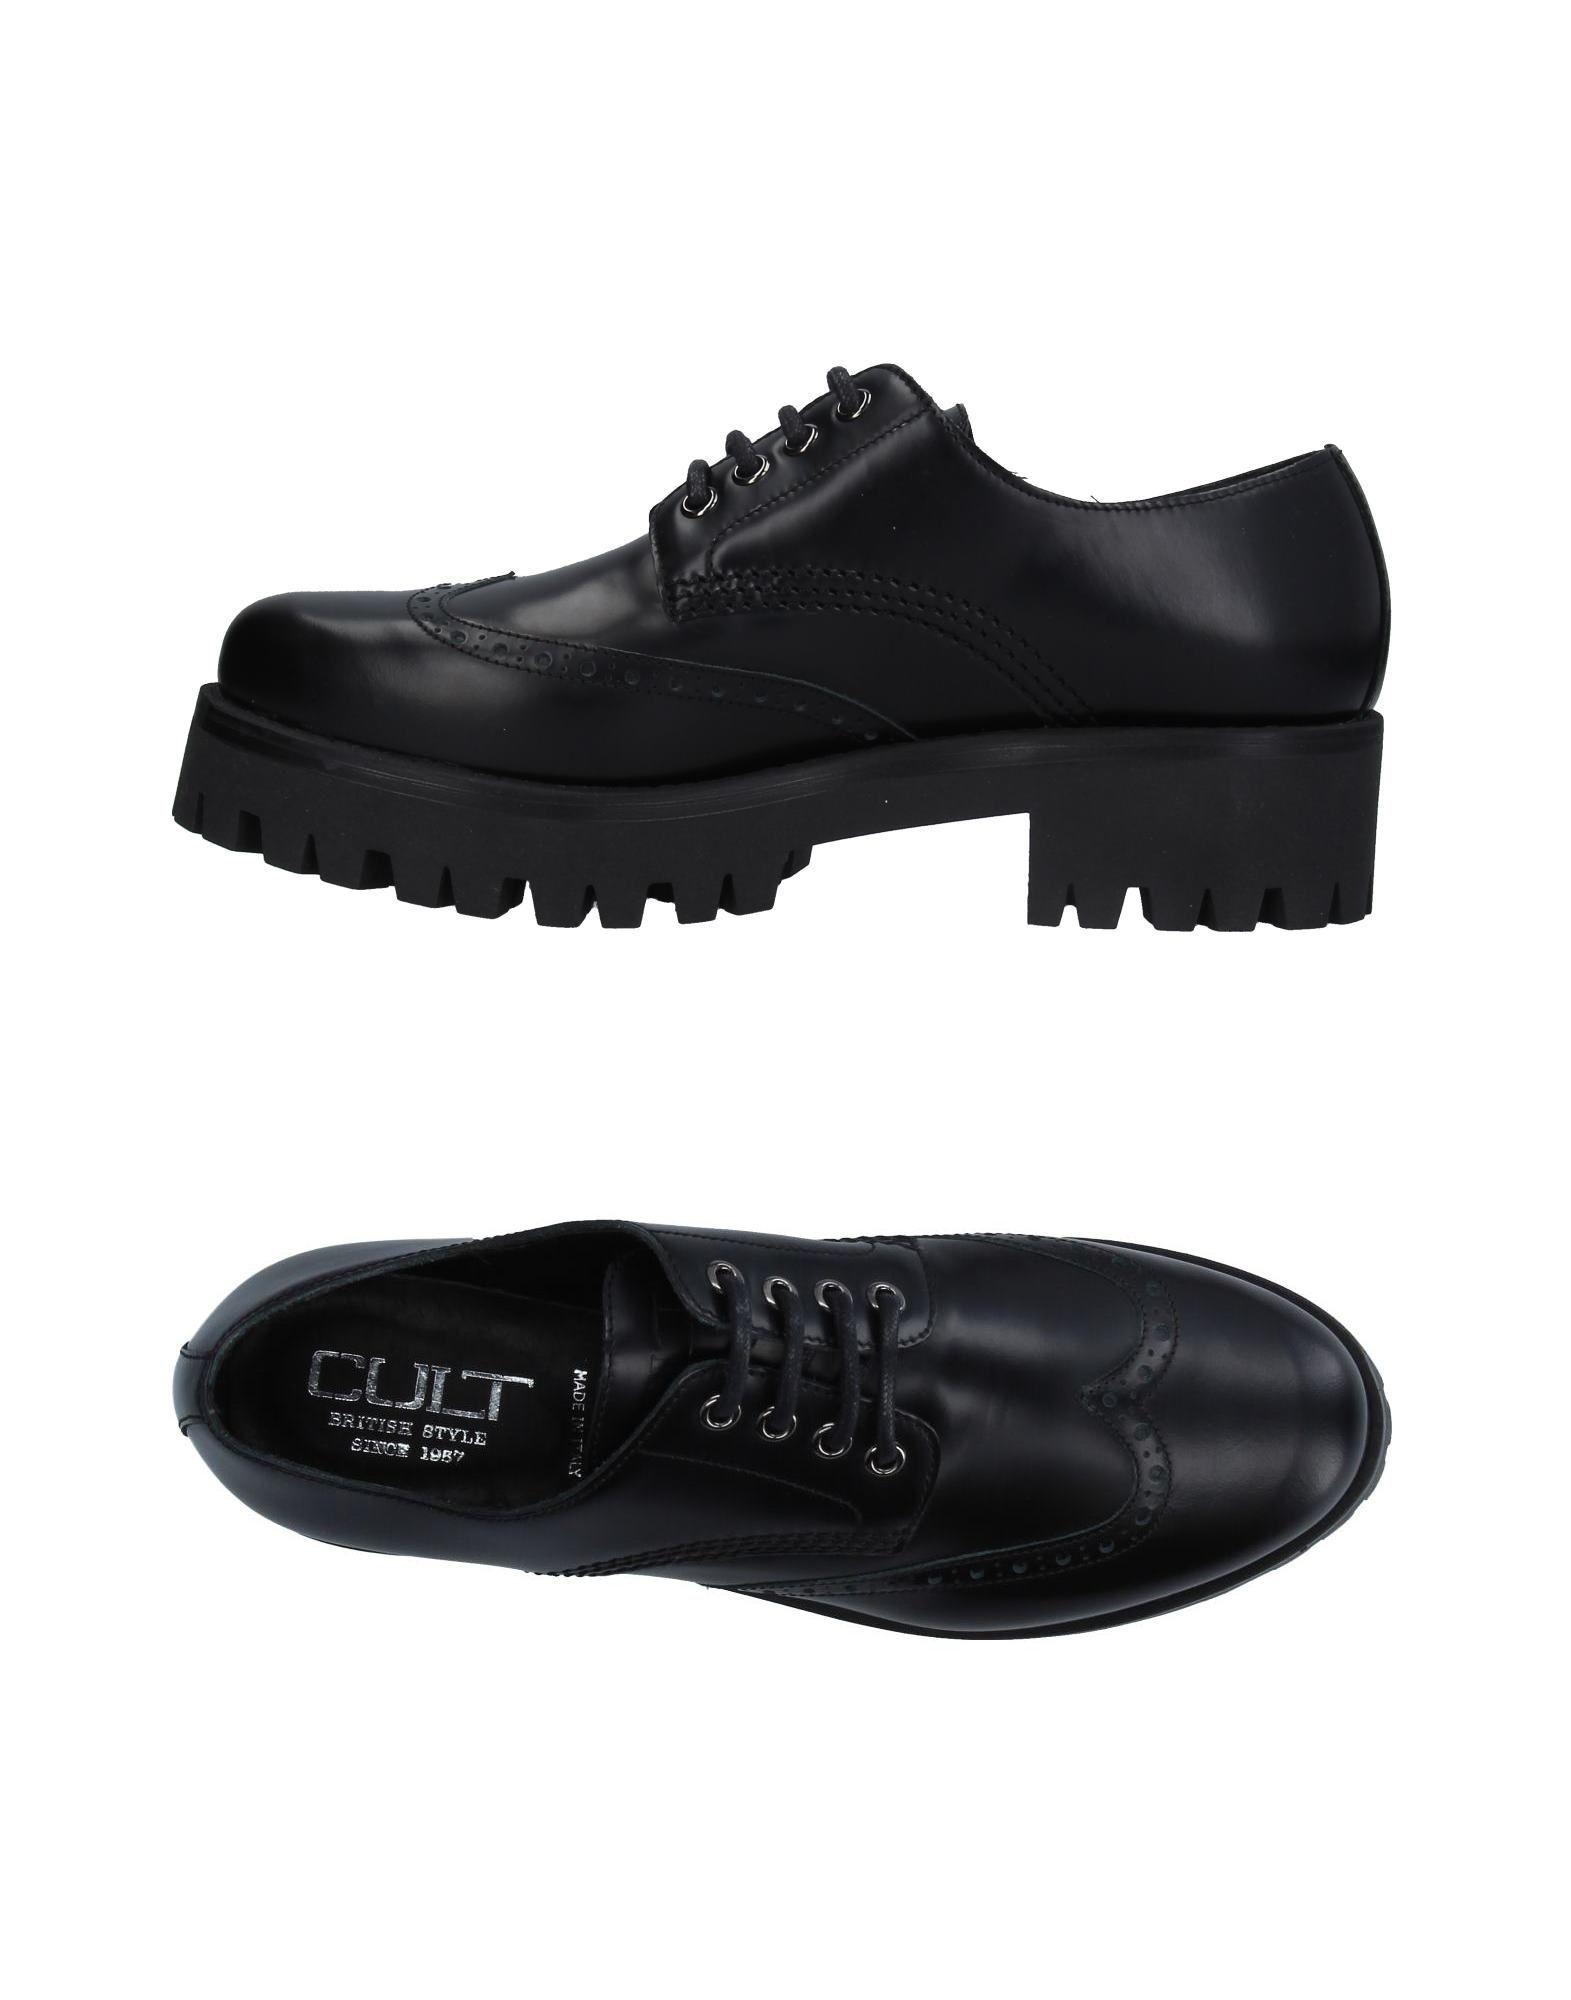 Cult Schnürschuhe Damen  11261636OR Gute Qualität beliebte Schuhe